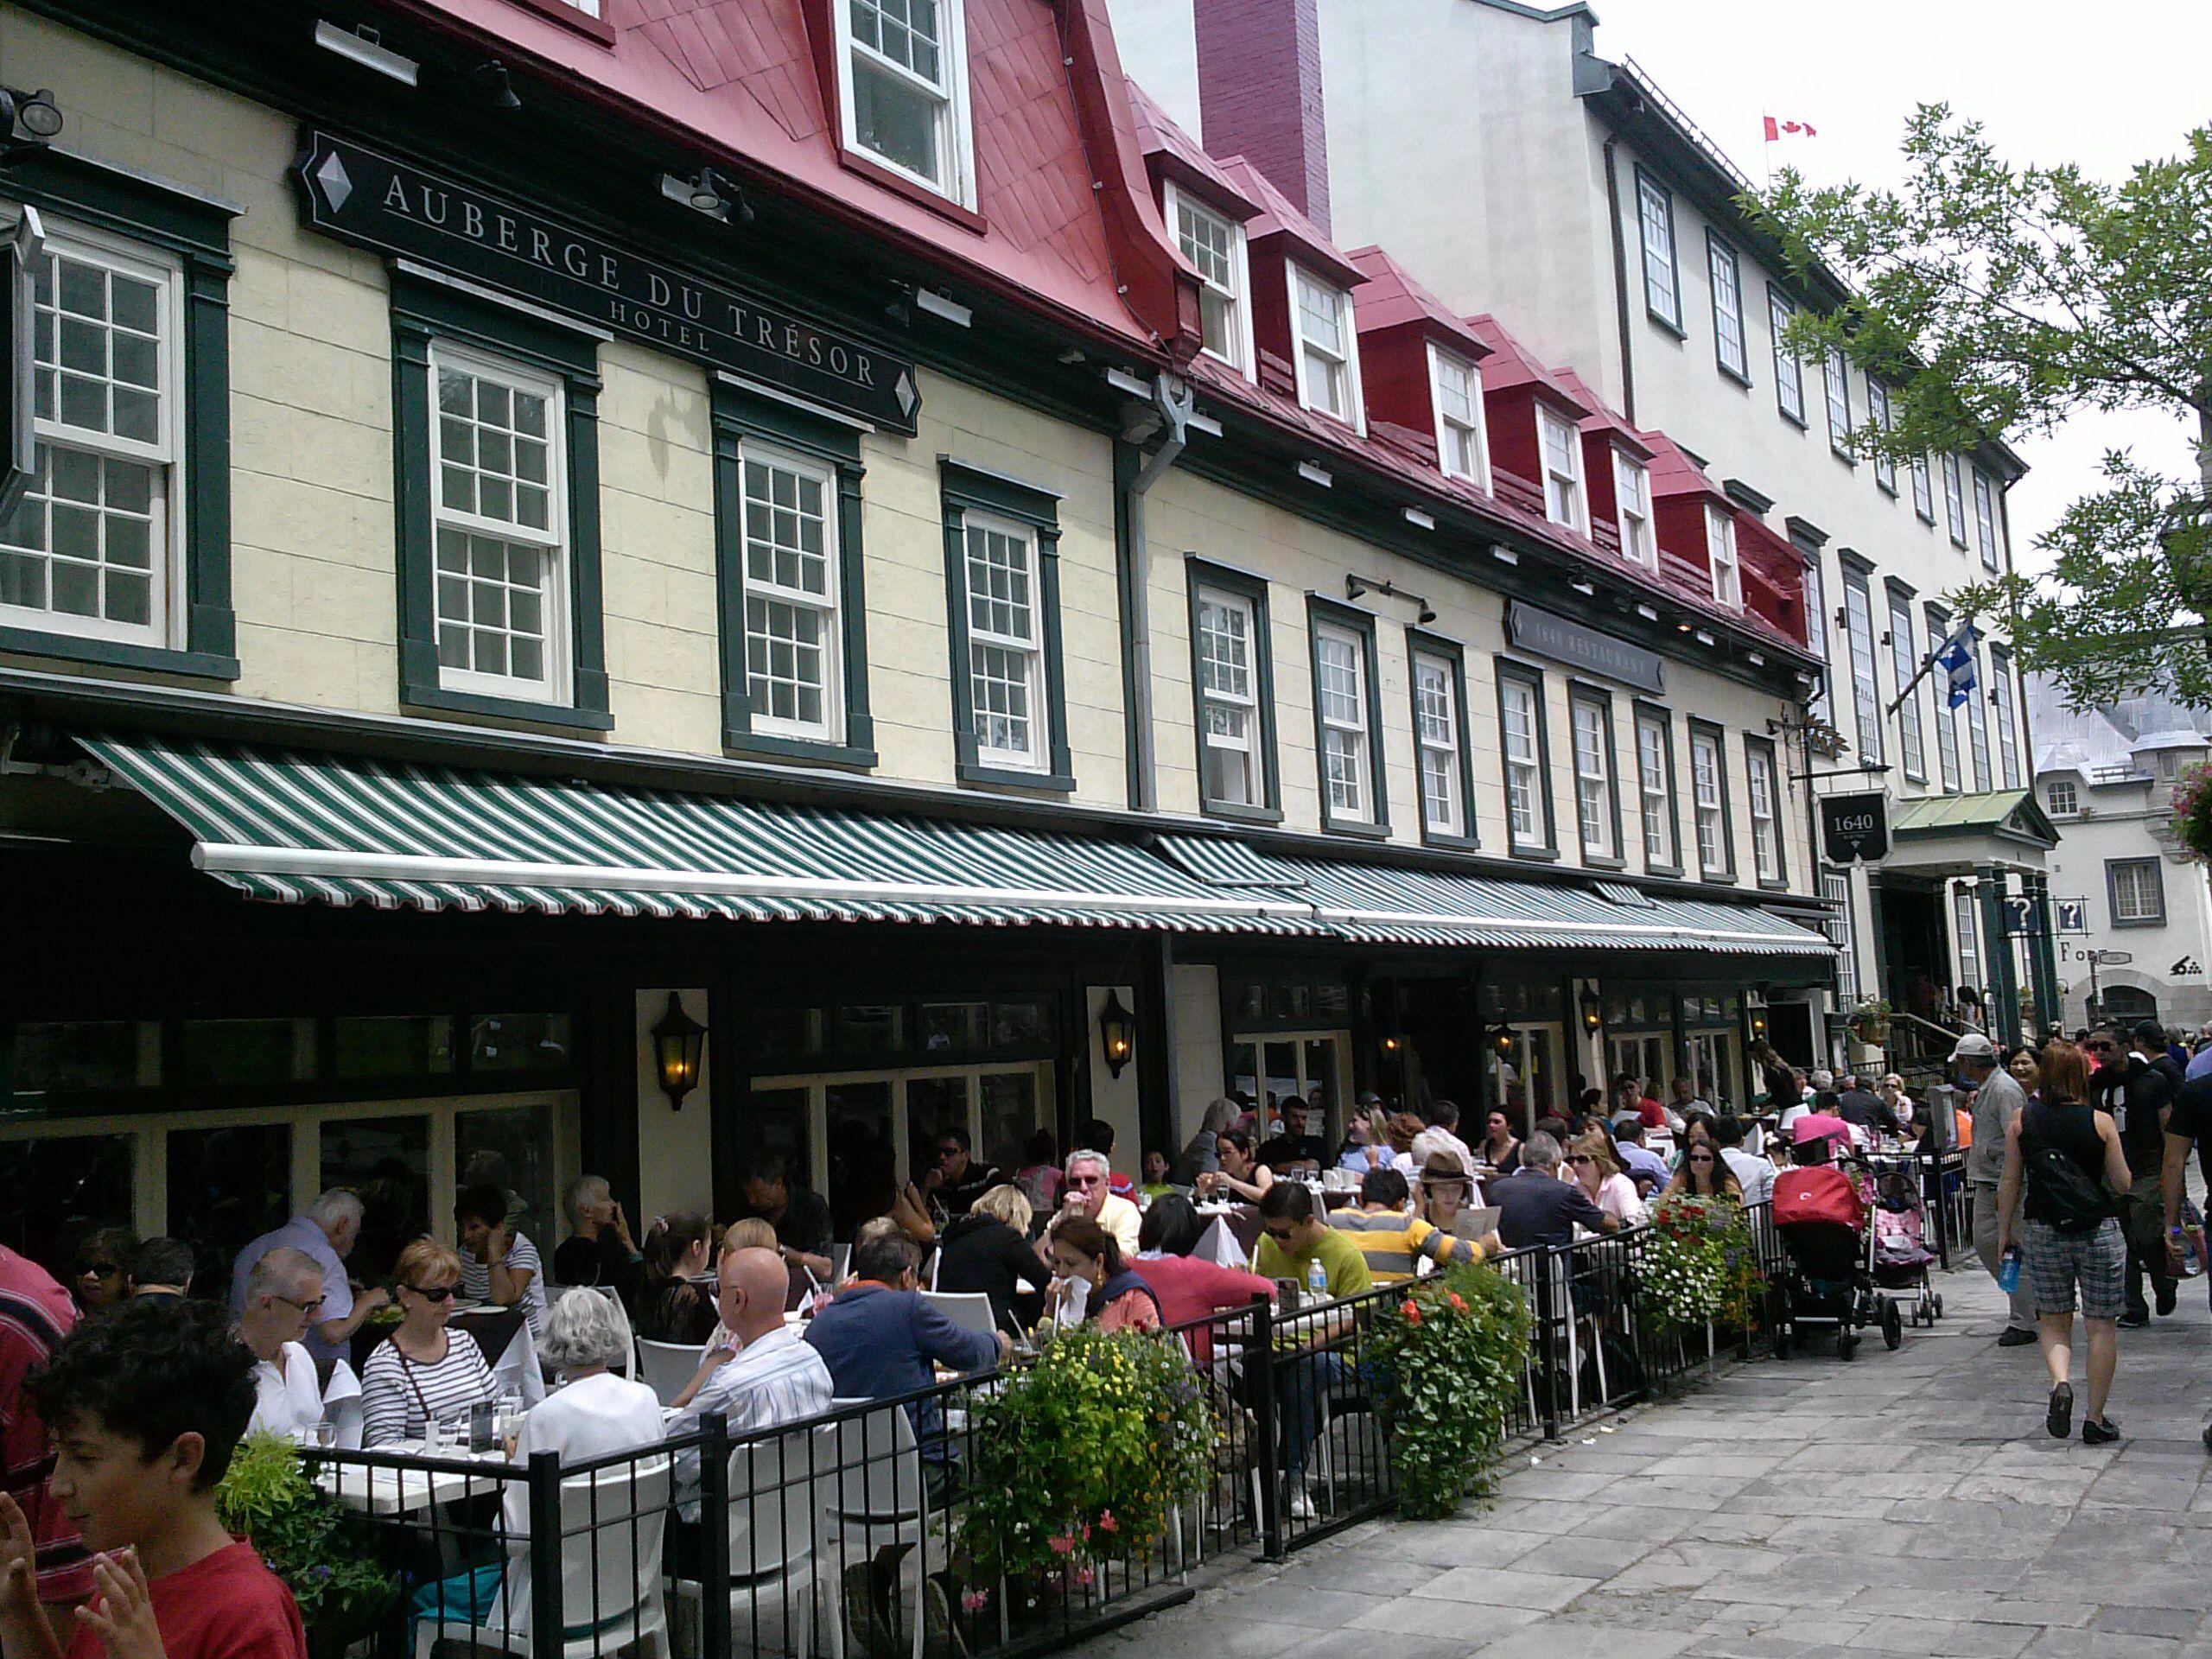 Quebec City In Old Quebec Restaurants Are Plentiful Villes